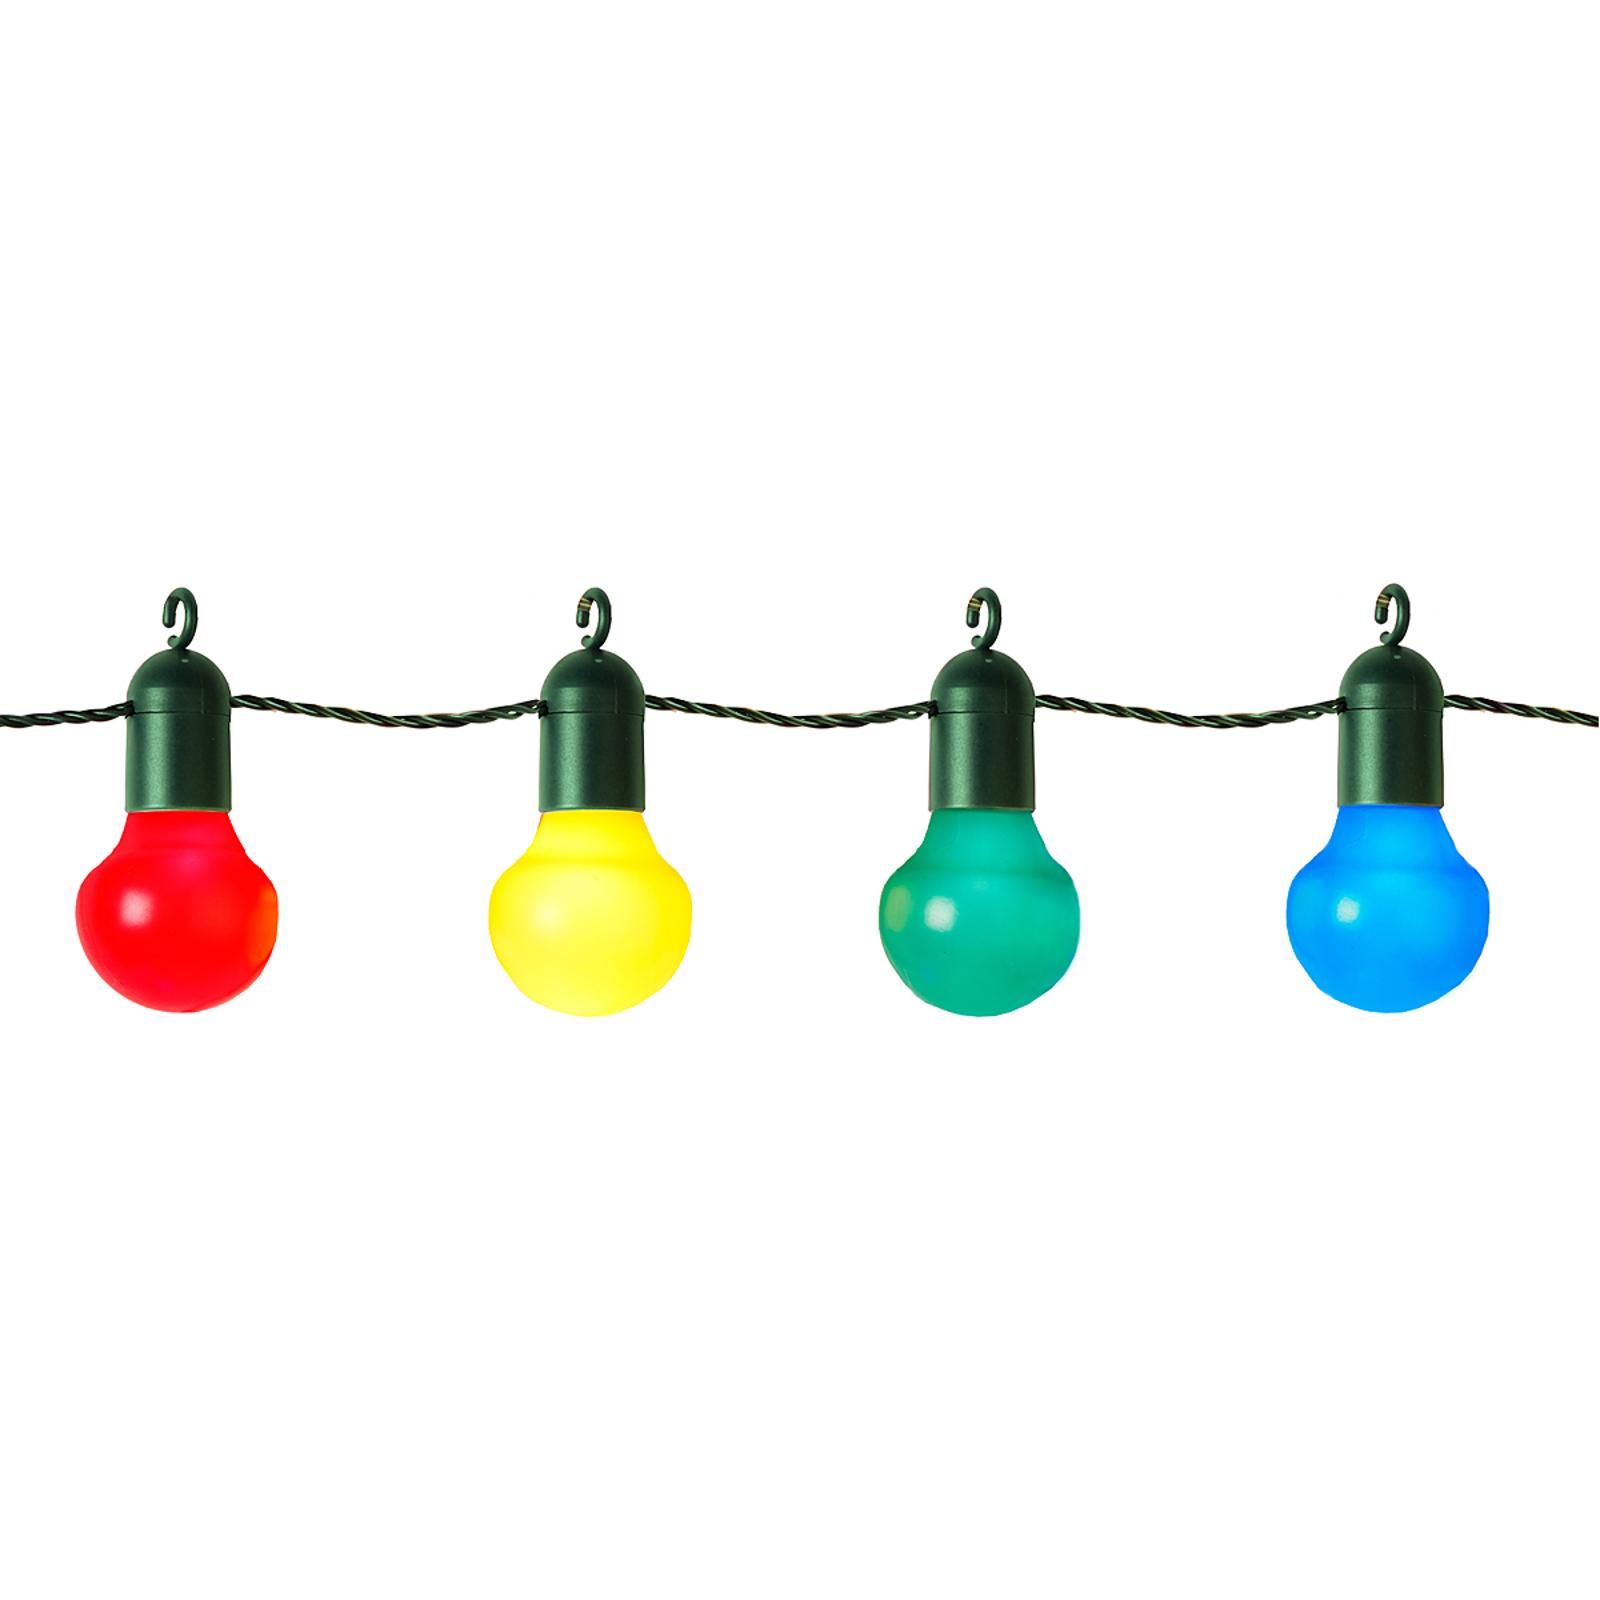 Catena luminosa ELIN da 20 LED colorati